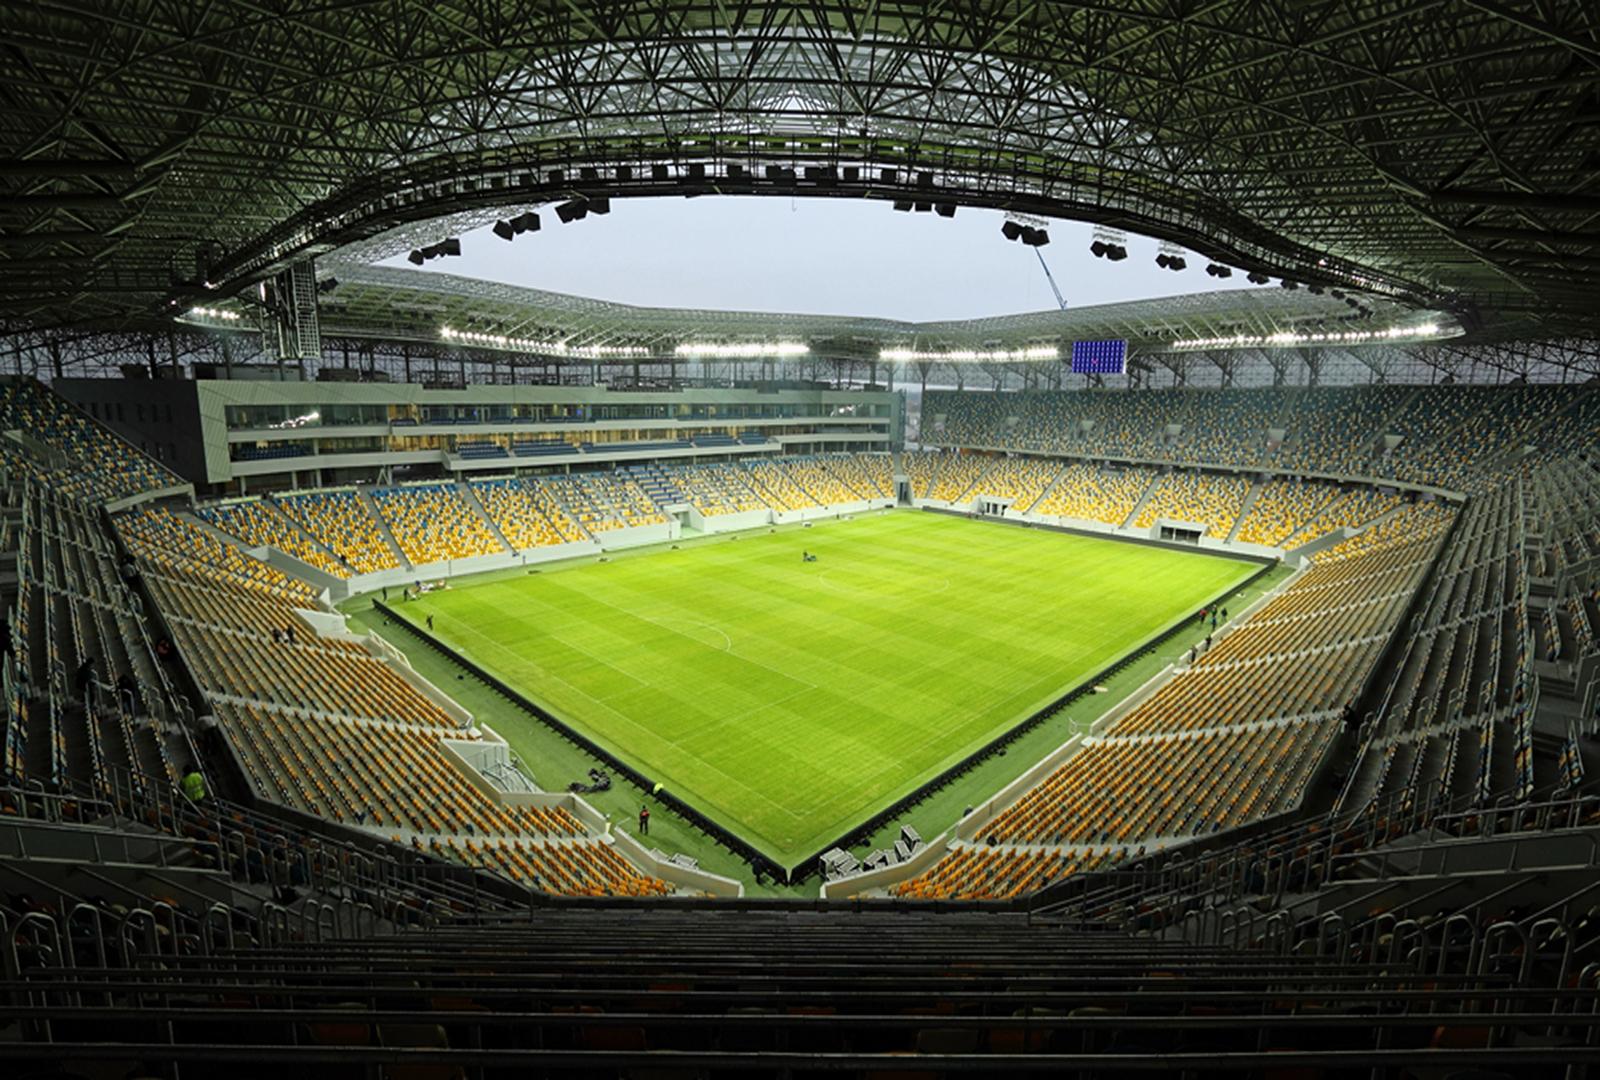 All soccer playerz hd wallpapers football stadiums new wallpapers 2012 - Soccer stadium hd ...